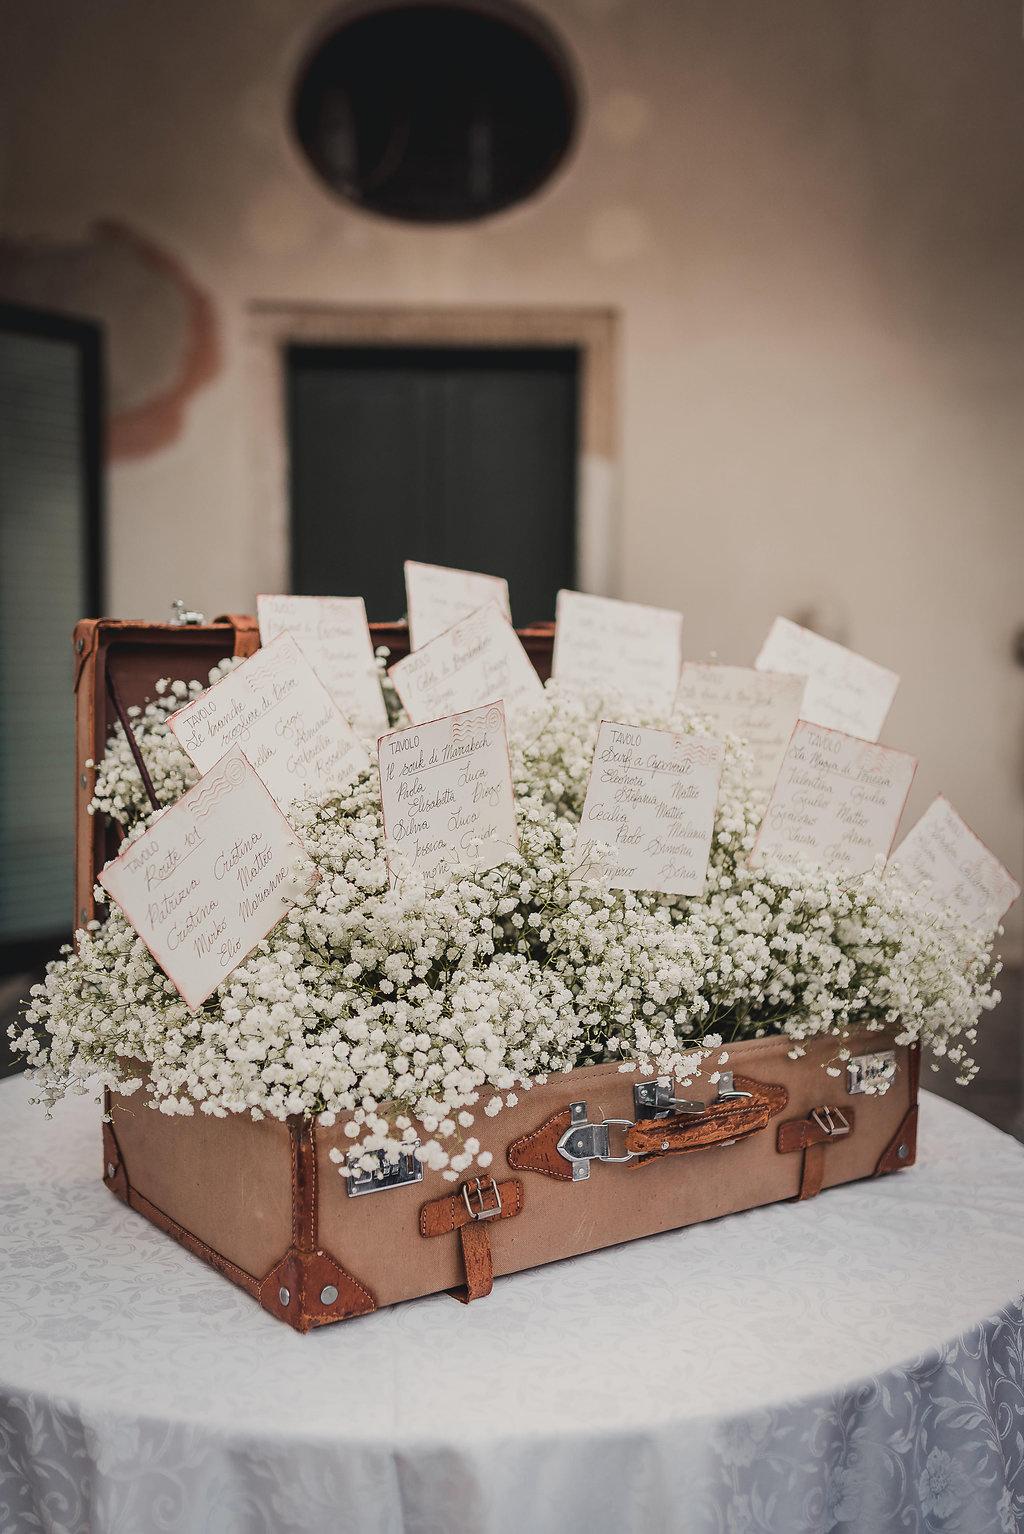 Matrimonio Tema Viaggio Tavoli : Il tableau de mariage u2013 6 idee da copiare grafica matrimoni